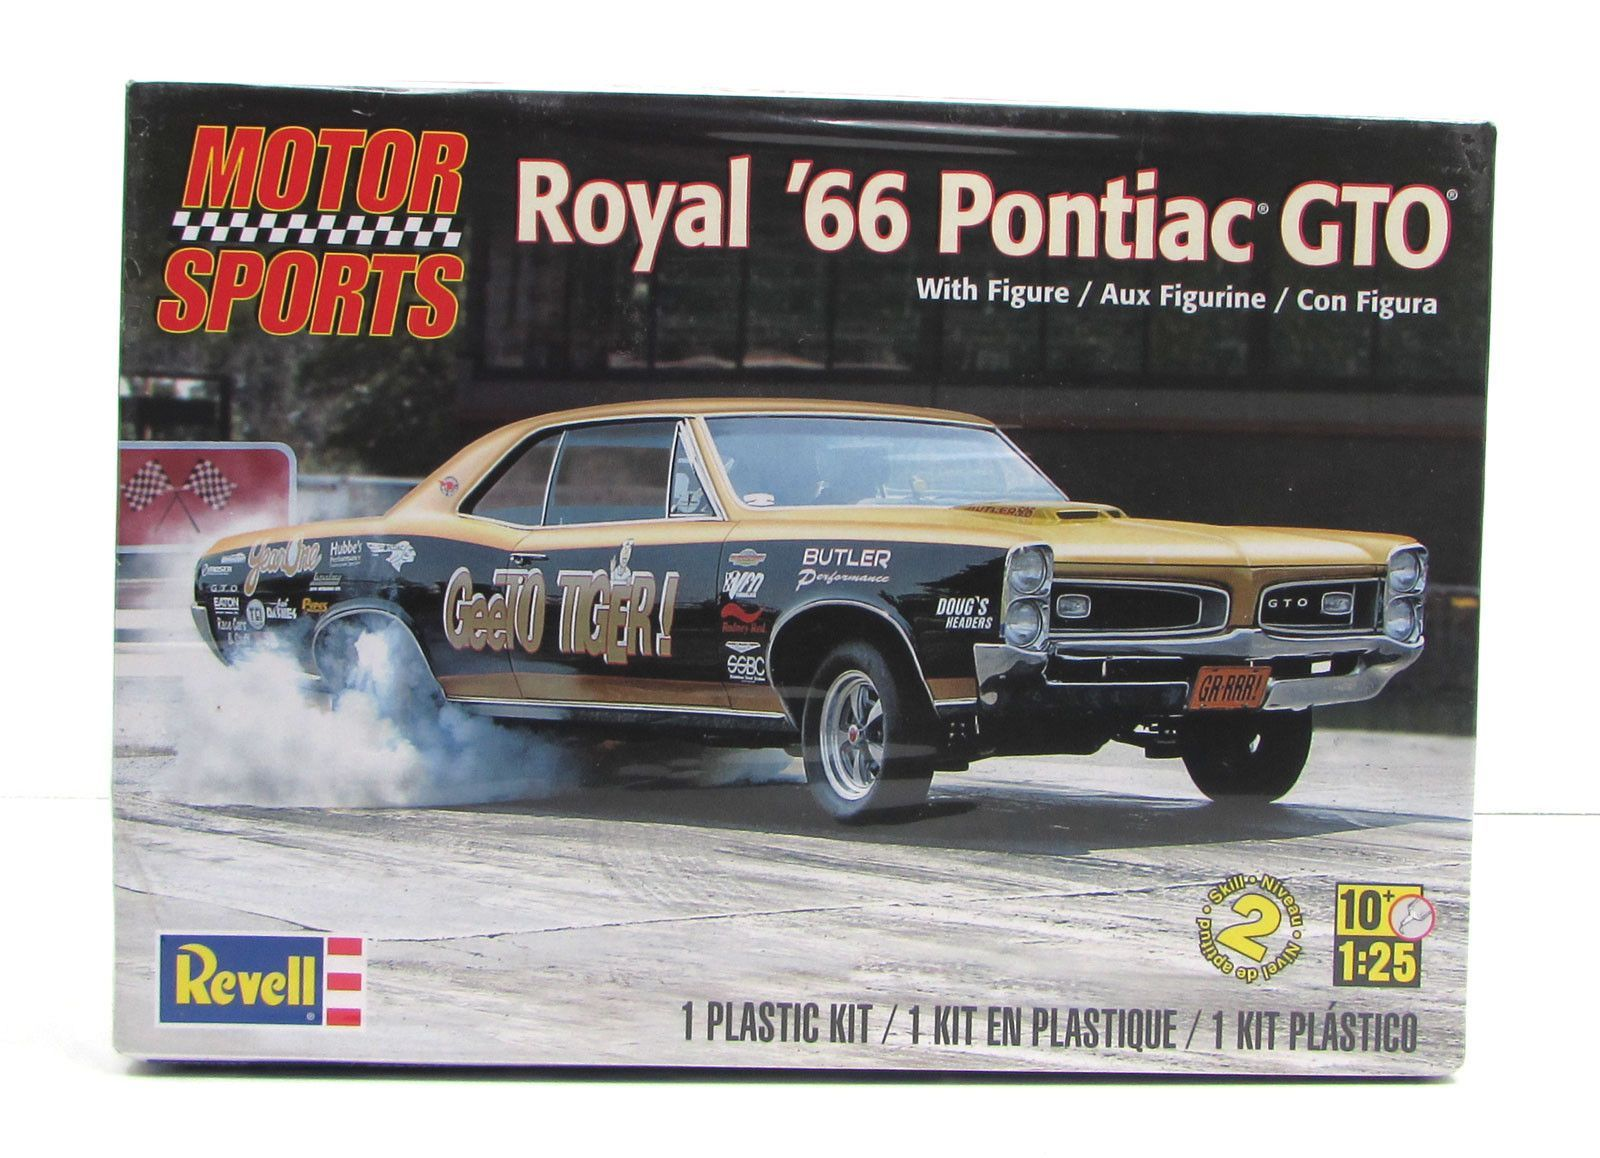 1969 cougar classic car restoration by doug jenkins garage - 1966 Pontiac Gto Royal Pontiac Revell 85 4037 1 25 New Car Model Kit